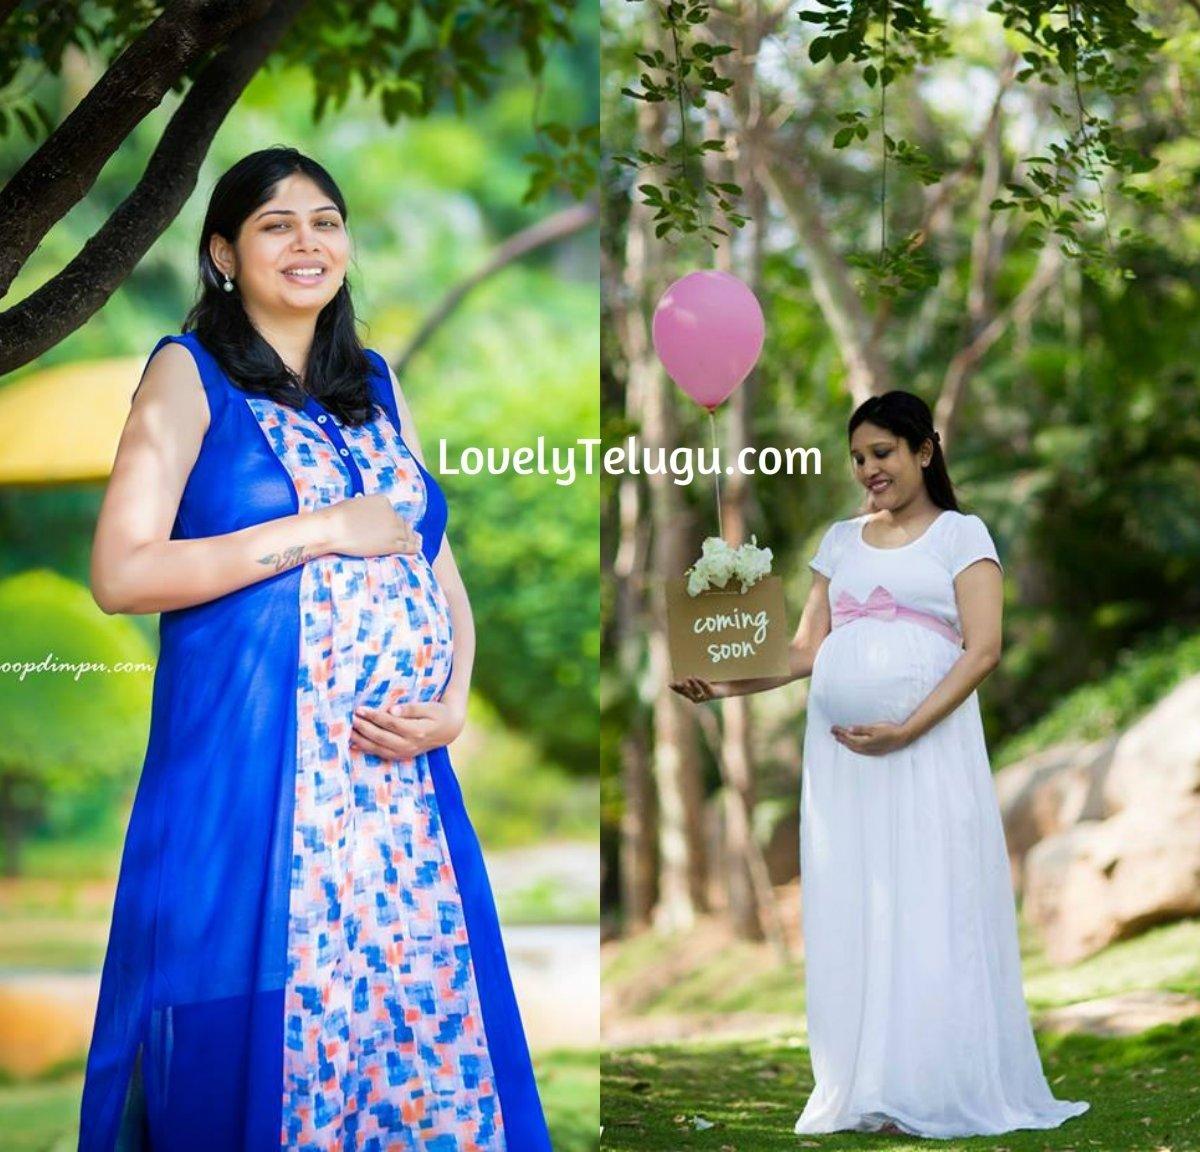 10 Amazing Maternity Photo Shoot Outfit Ideas 12 simple outfit ideas for maternity shoot 2020